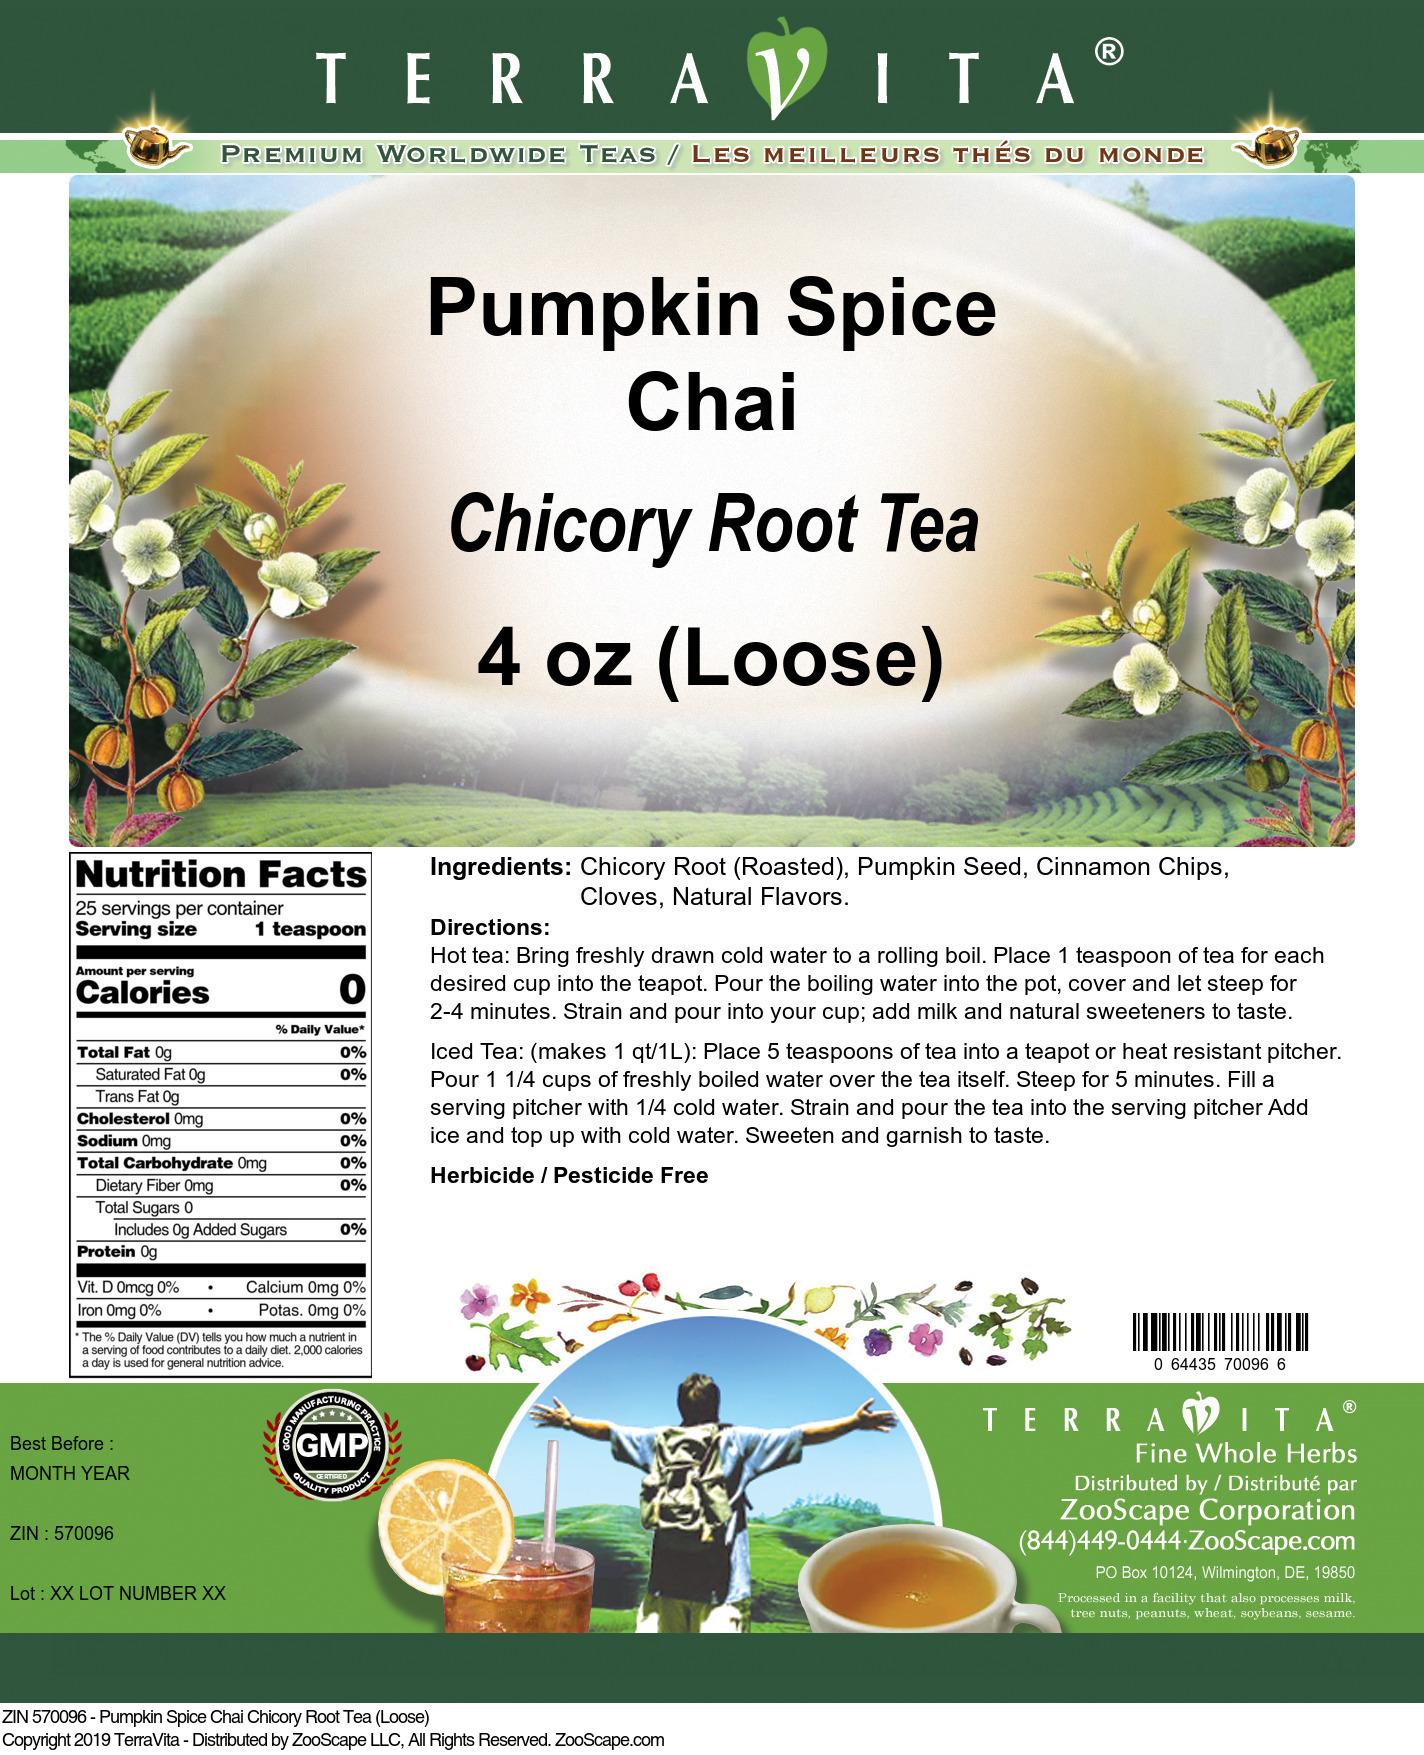 Pumpkin Spice Chai Chicory Root